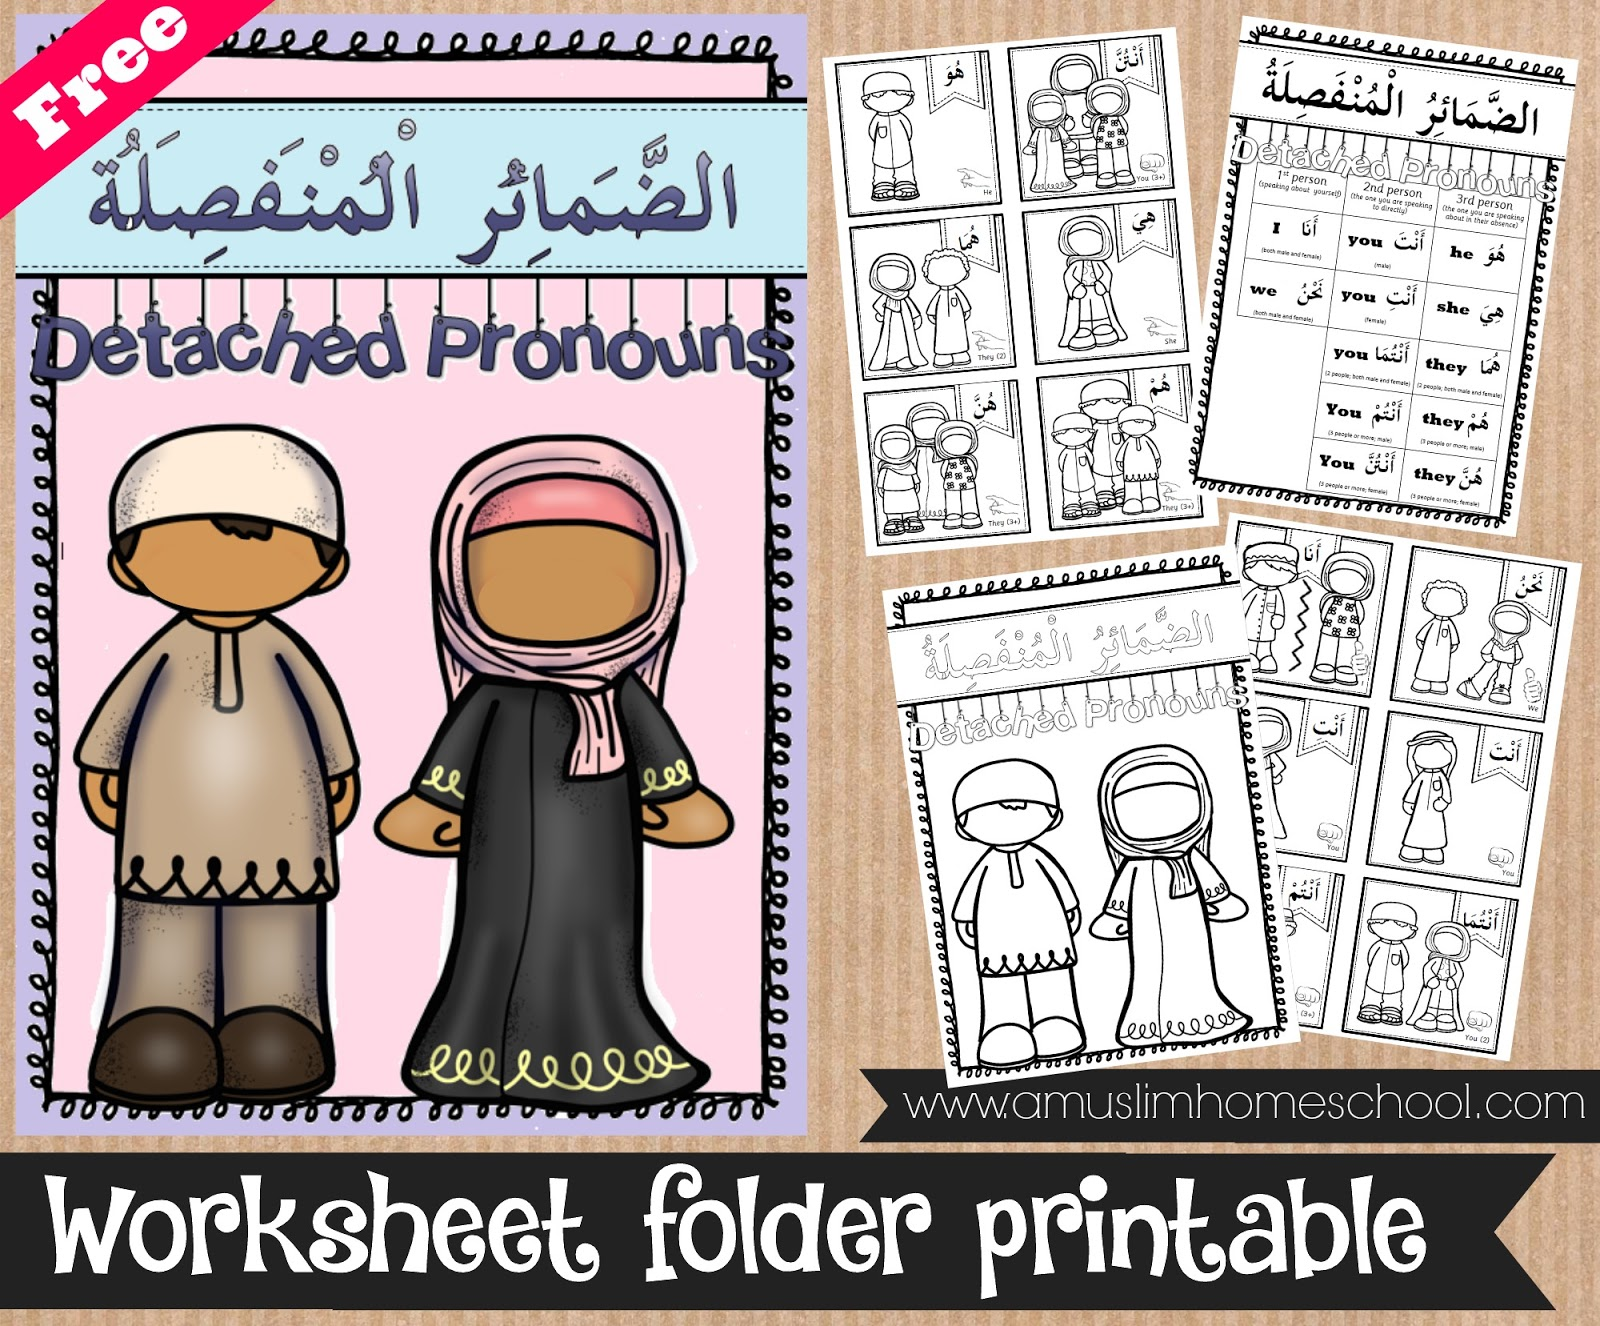 A Muslim Homeschool Arabic Detached Pronouns Worksheet